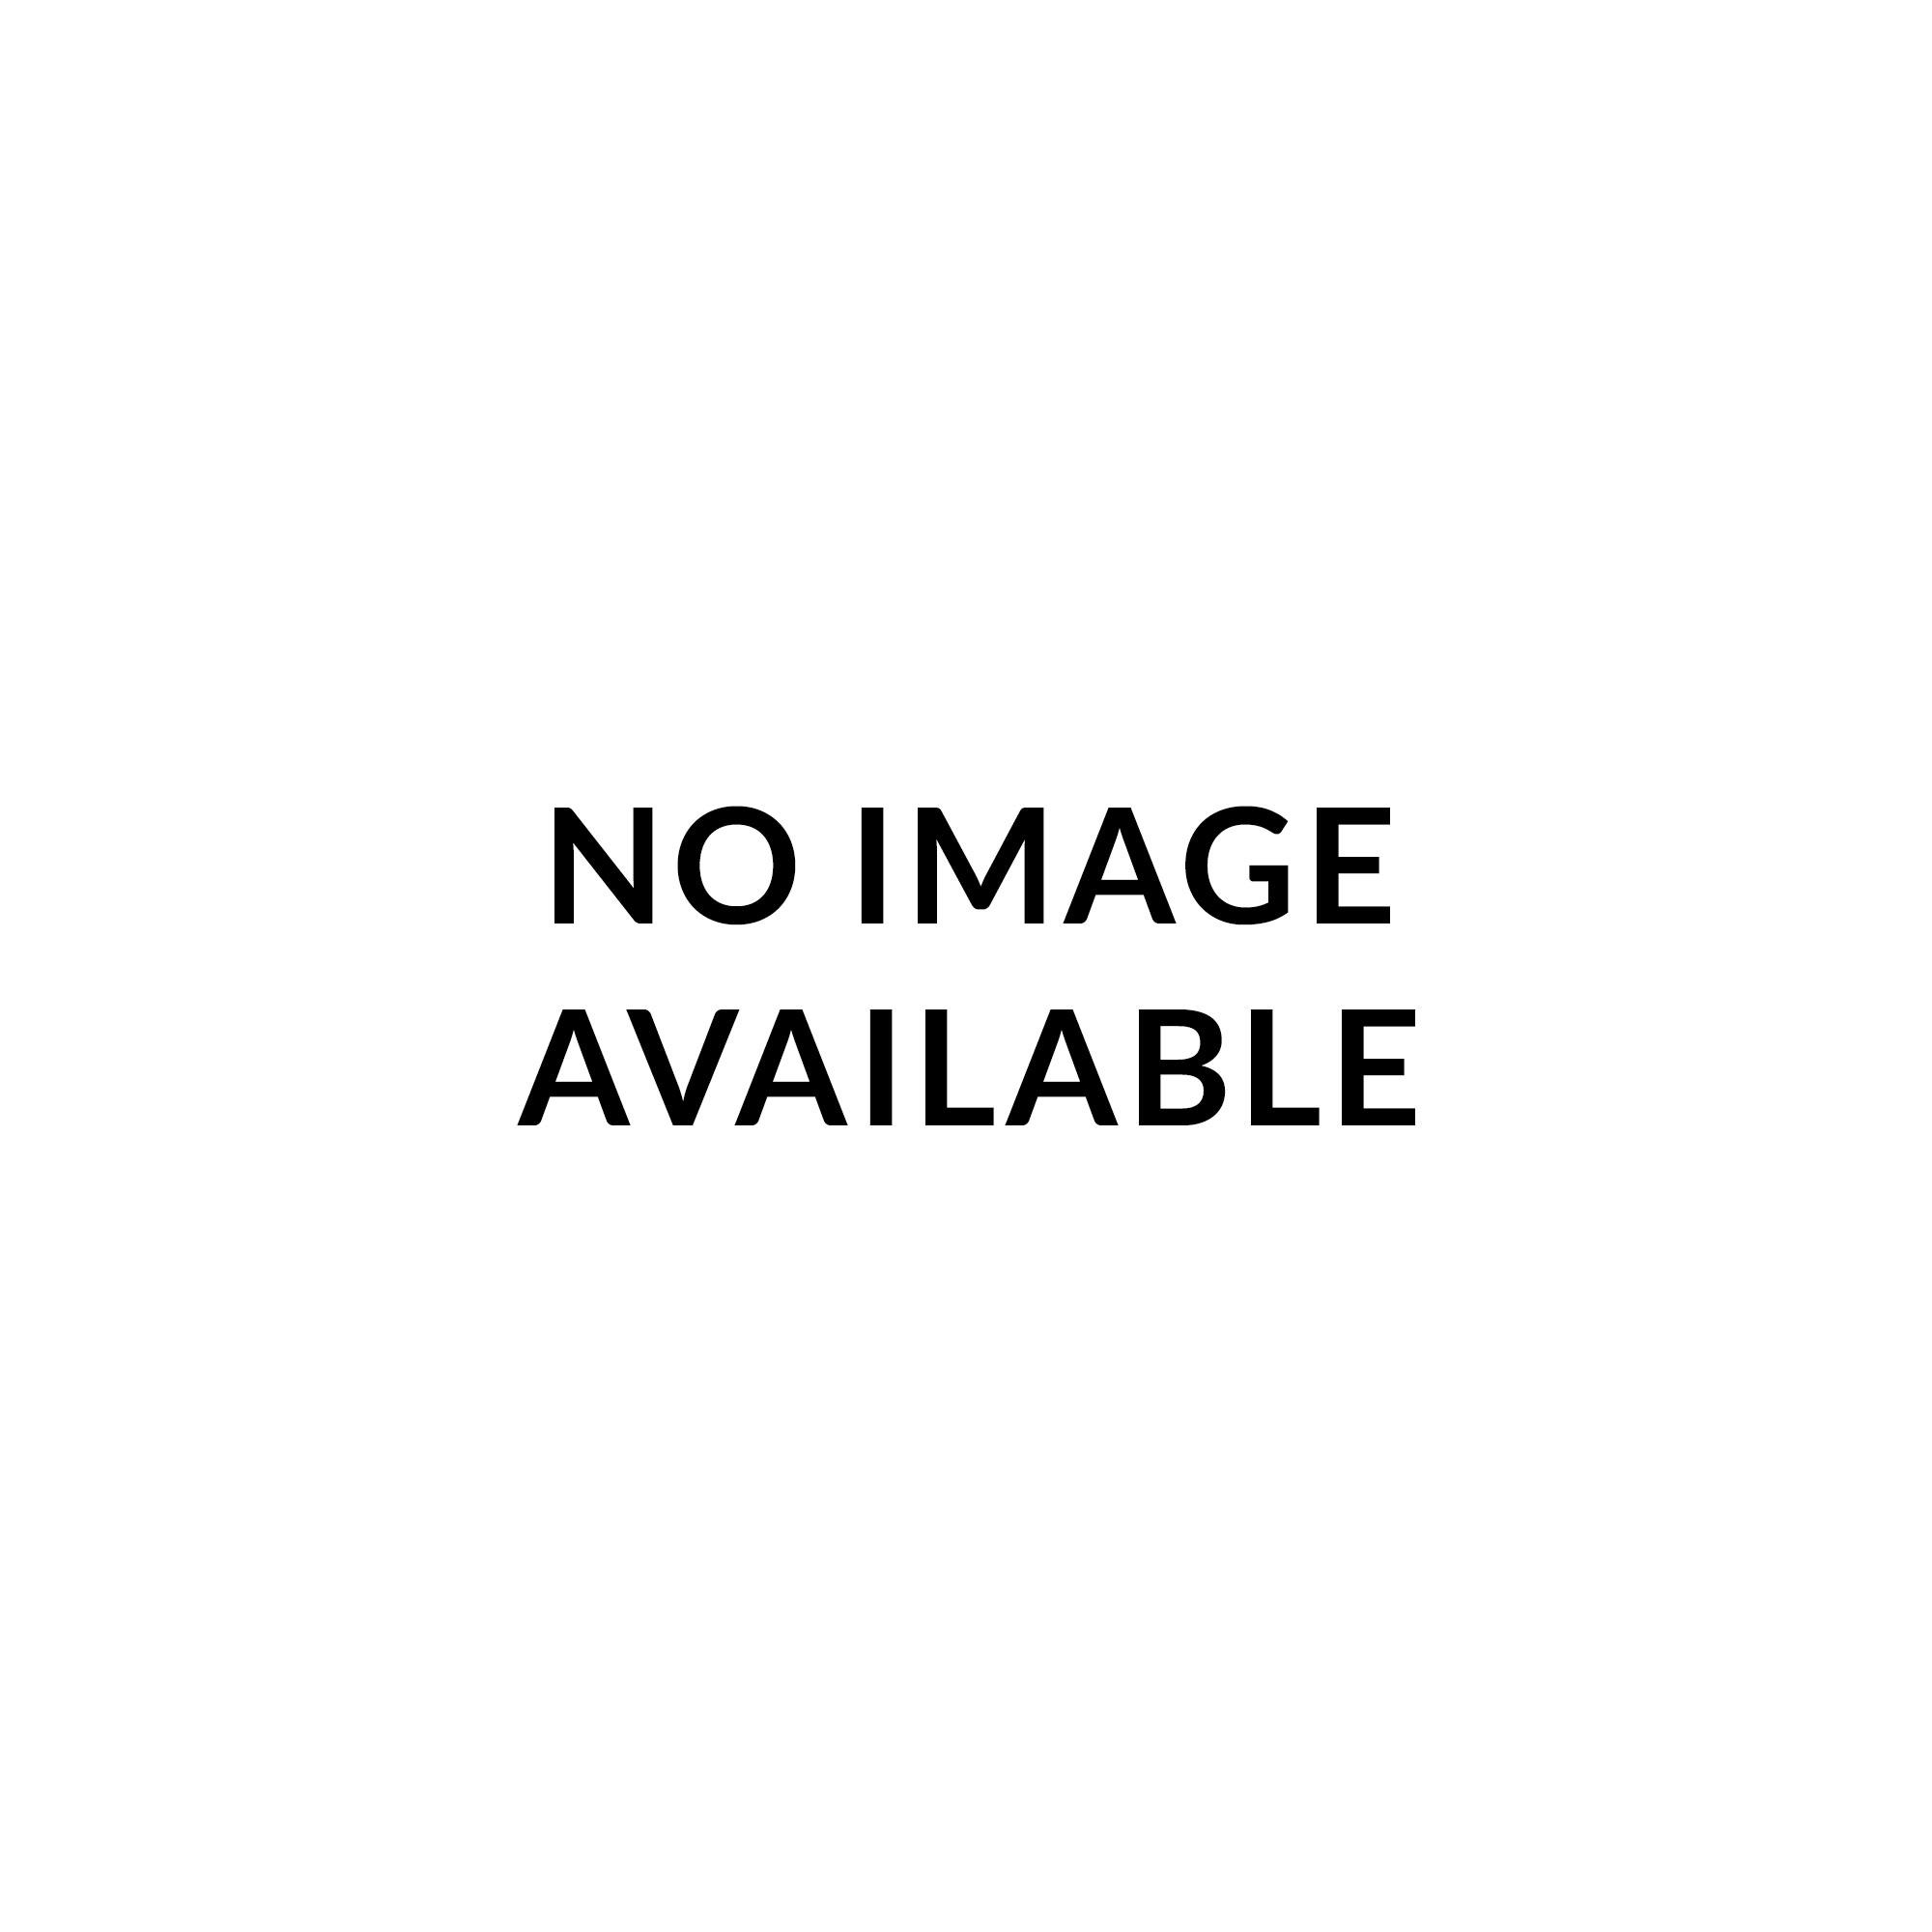 DiMarzio DP117 HS-3 White Single Coil Pickup